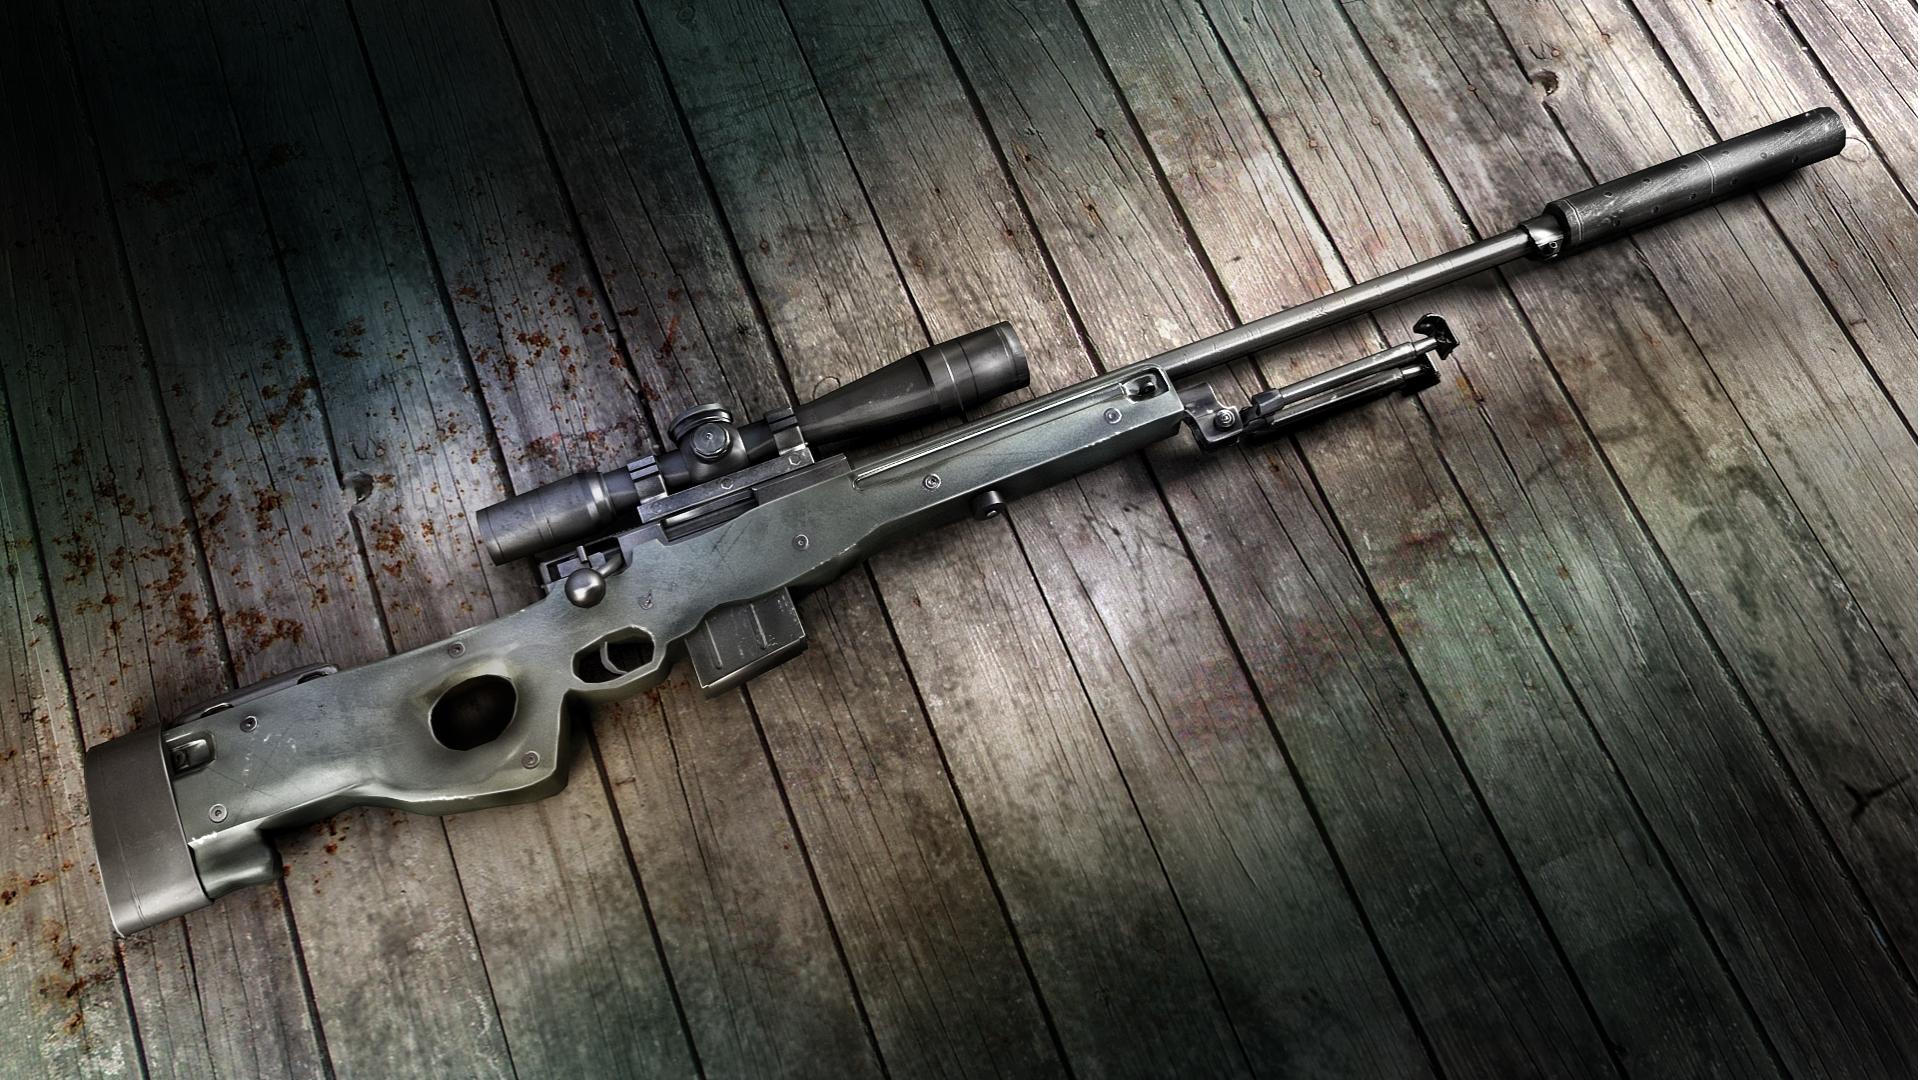 Marine Sniper Wallpapers Top Free Marine Sniper